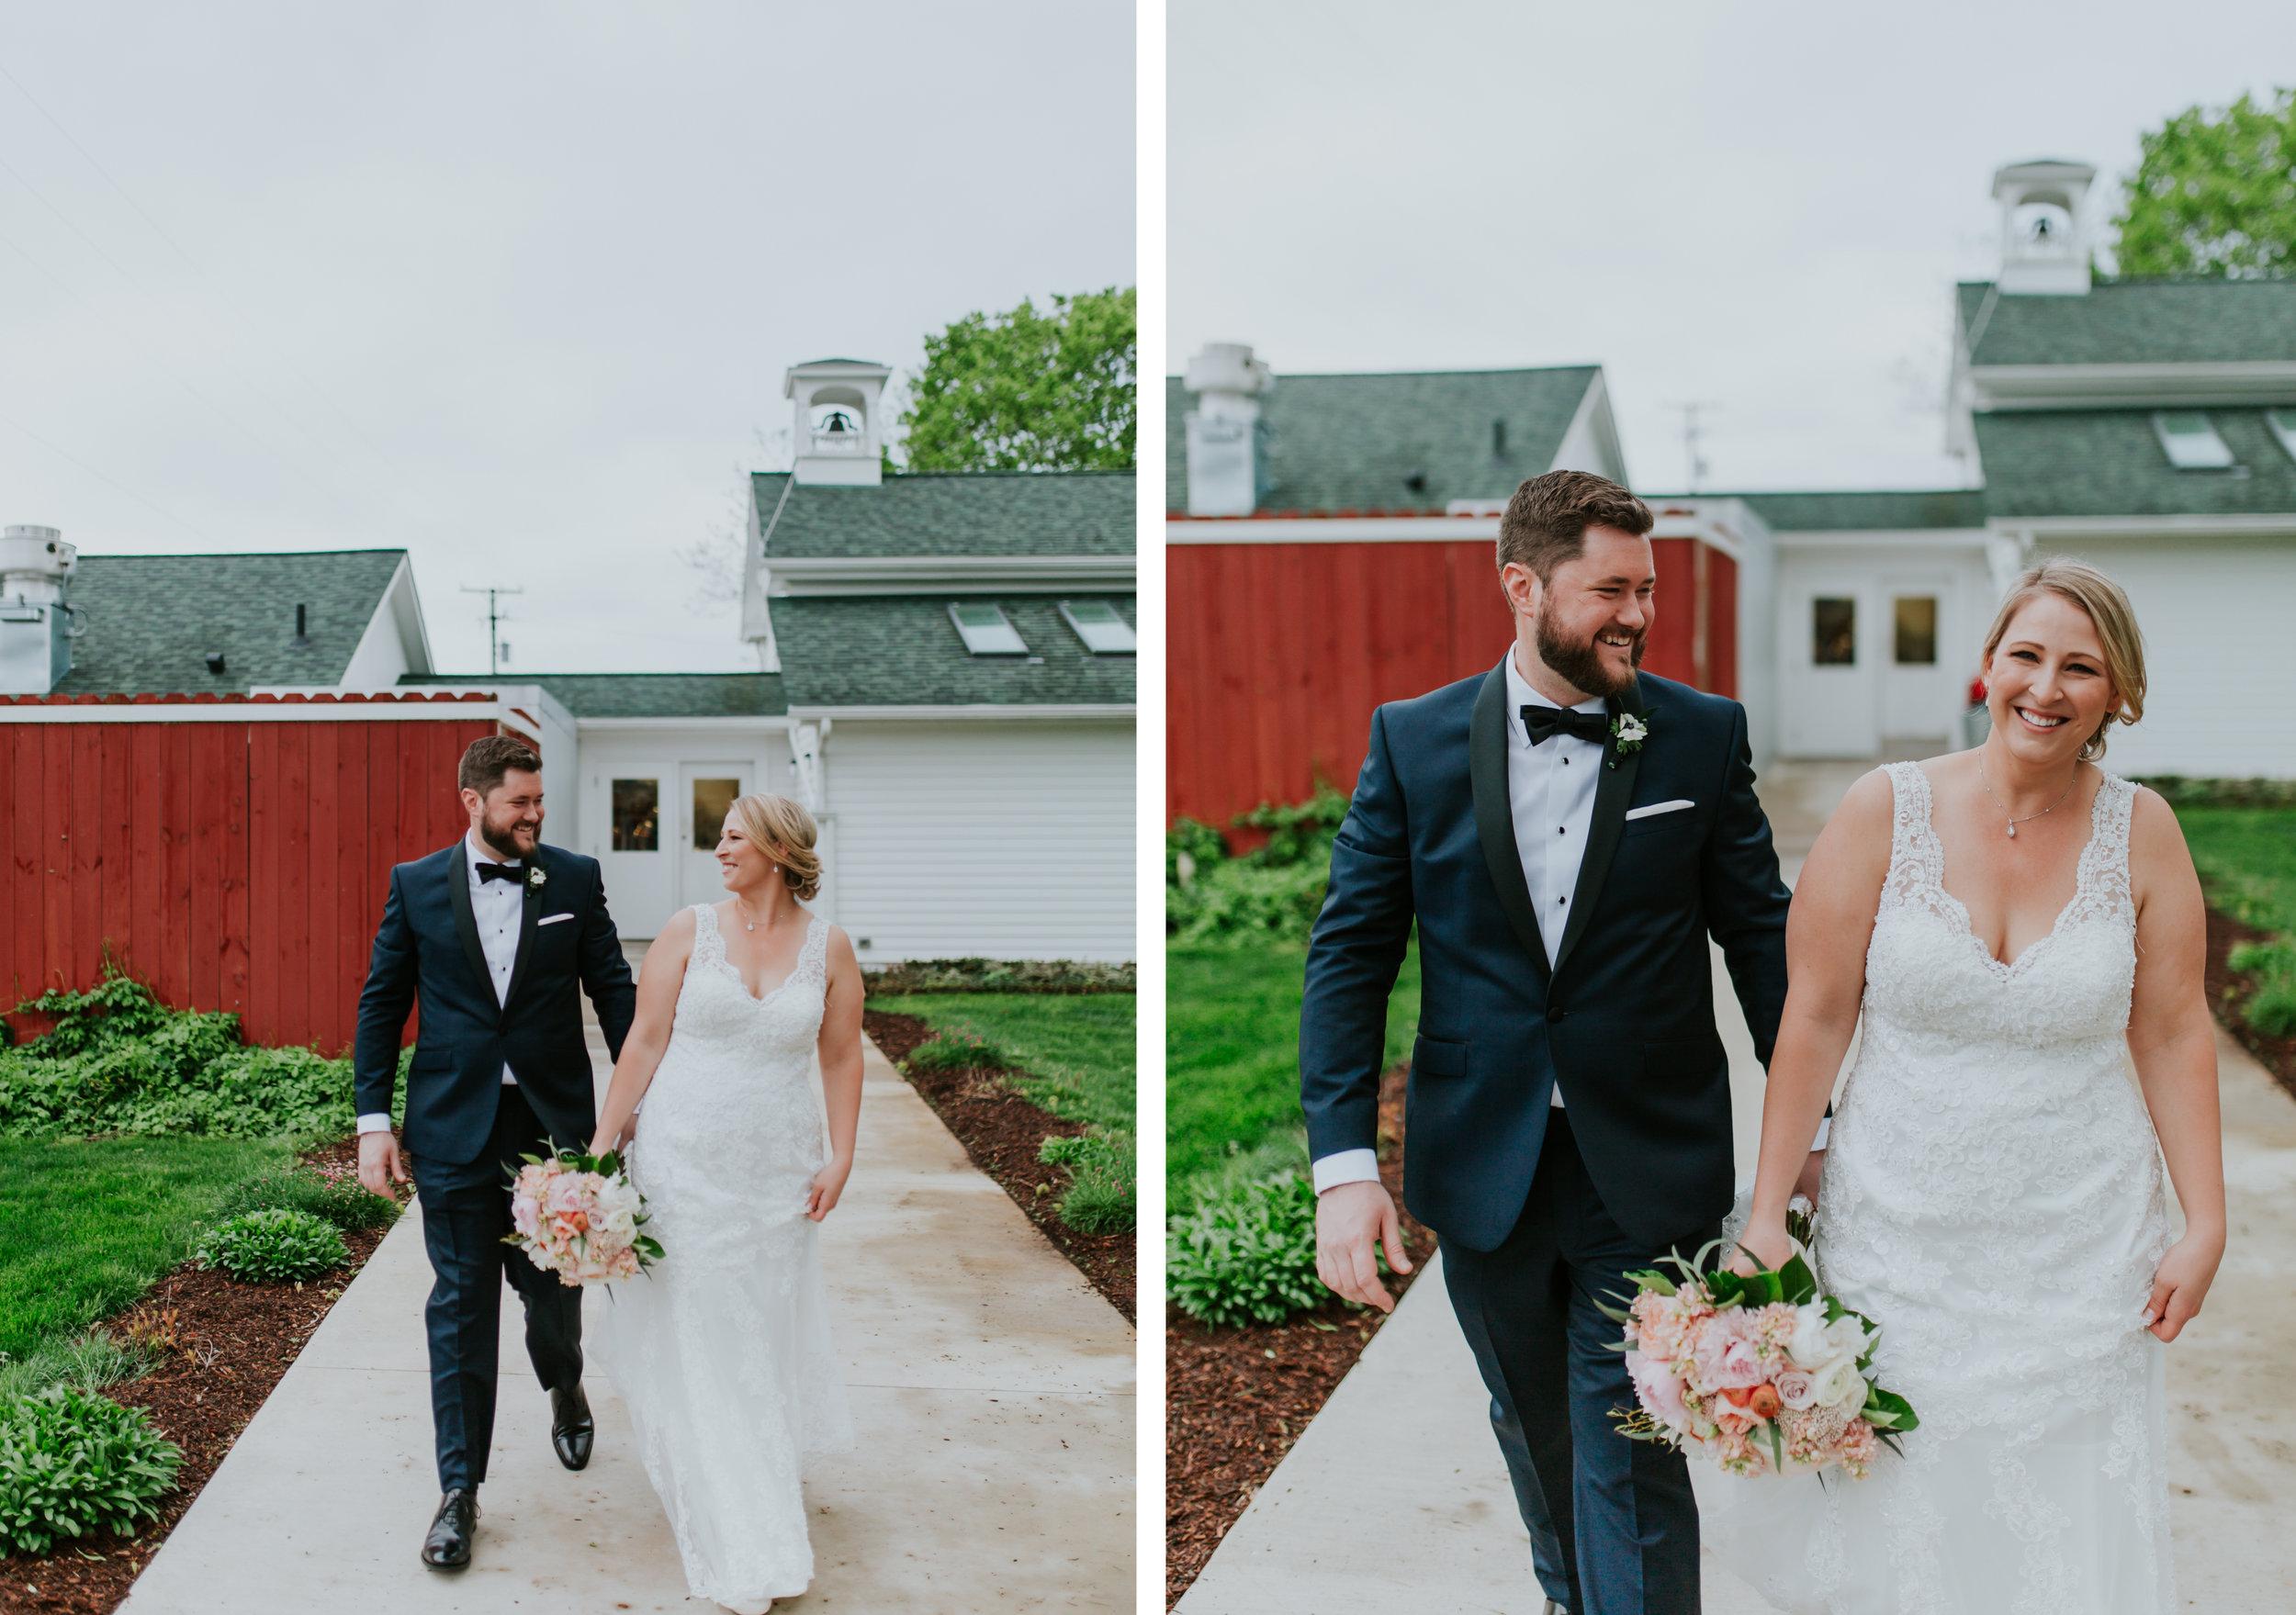 lola-grace-photography-cornman-farms-summer-wedding-61.jpg